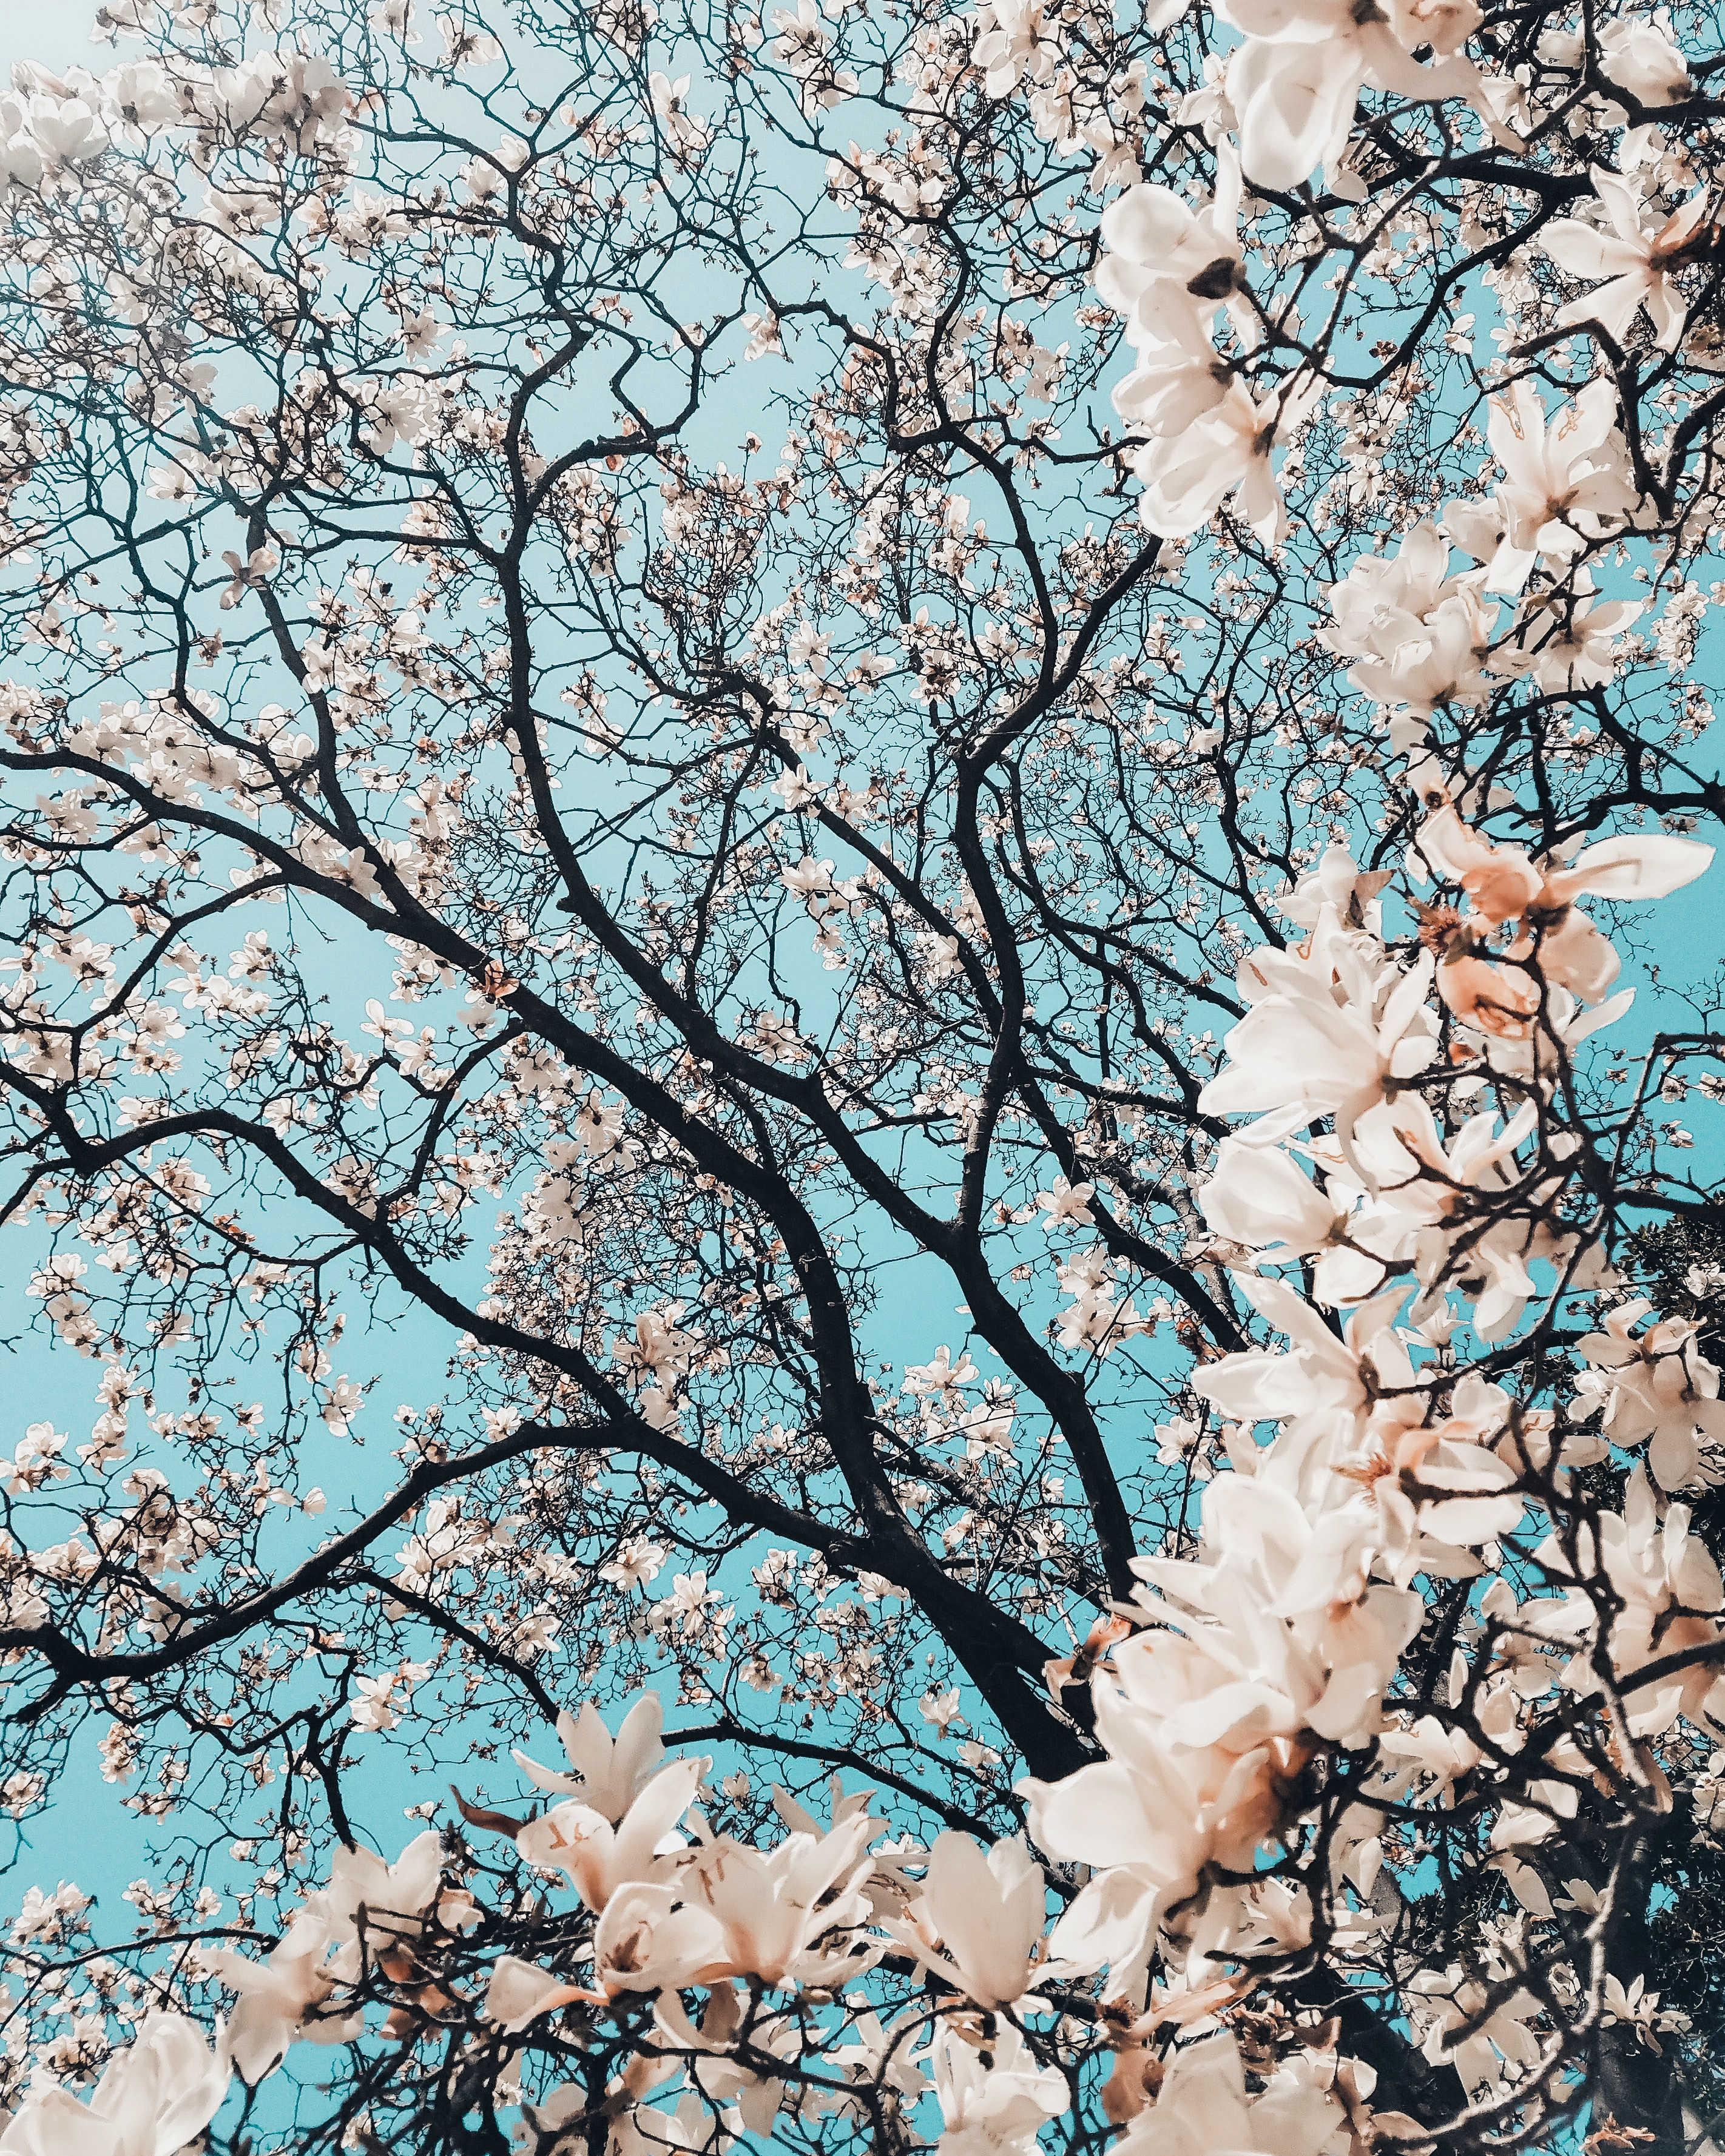 photo of cherry trees by Meriç Dağli